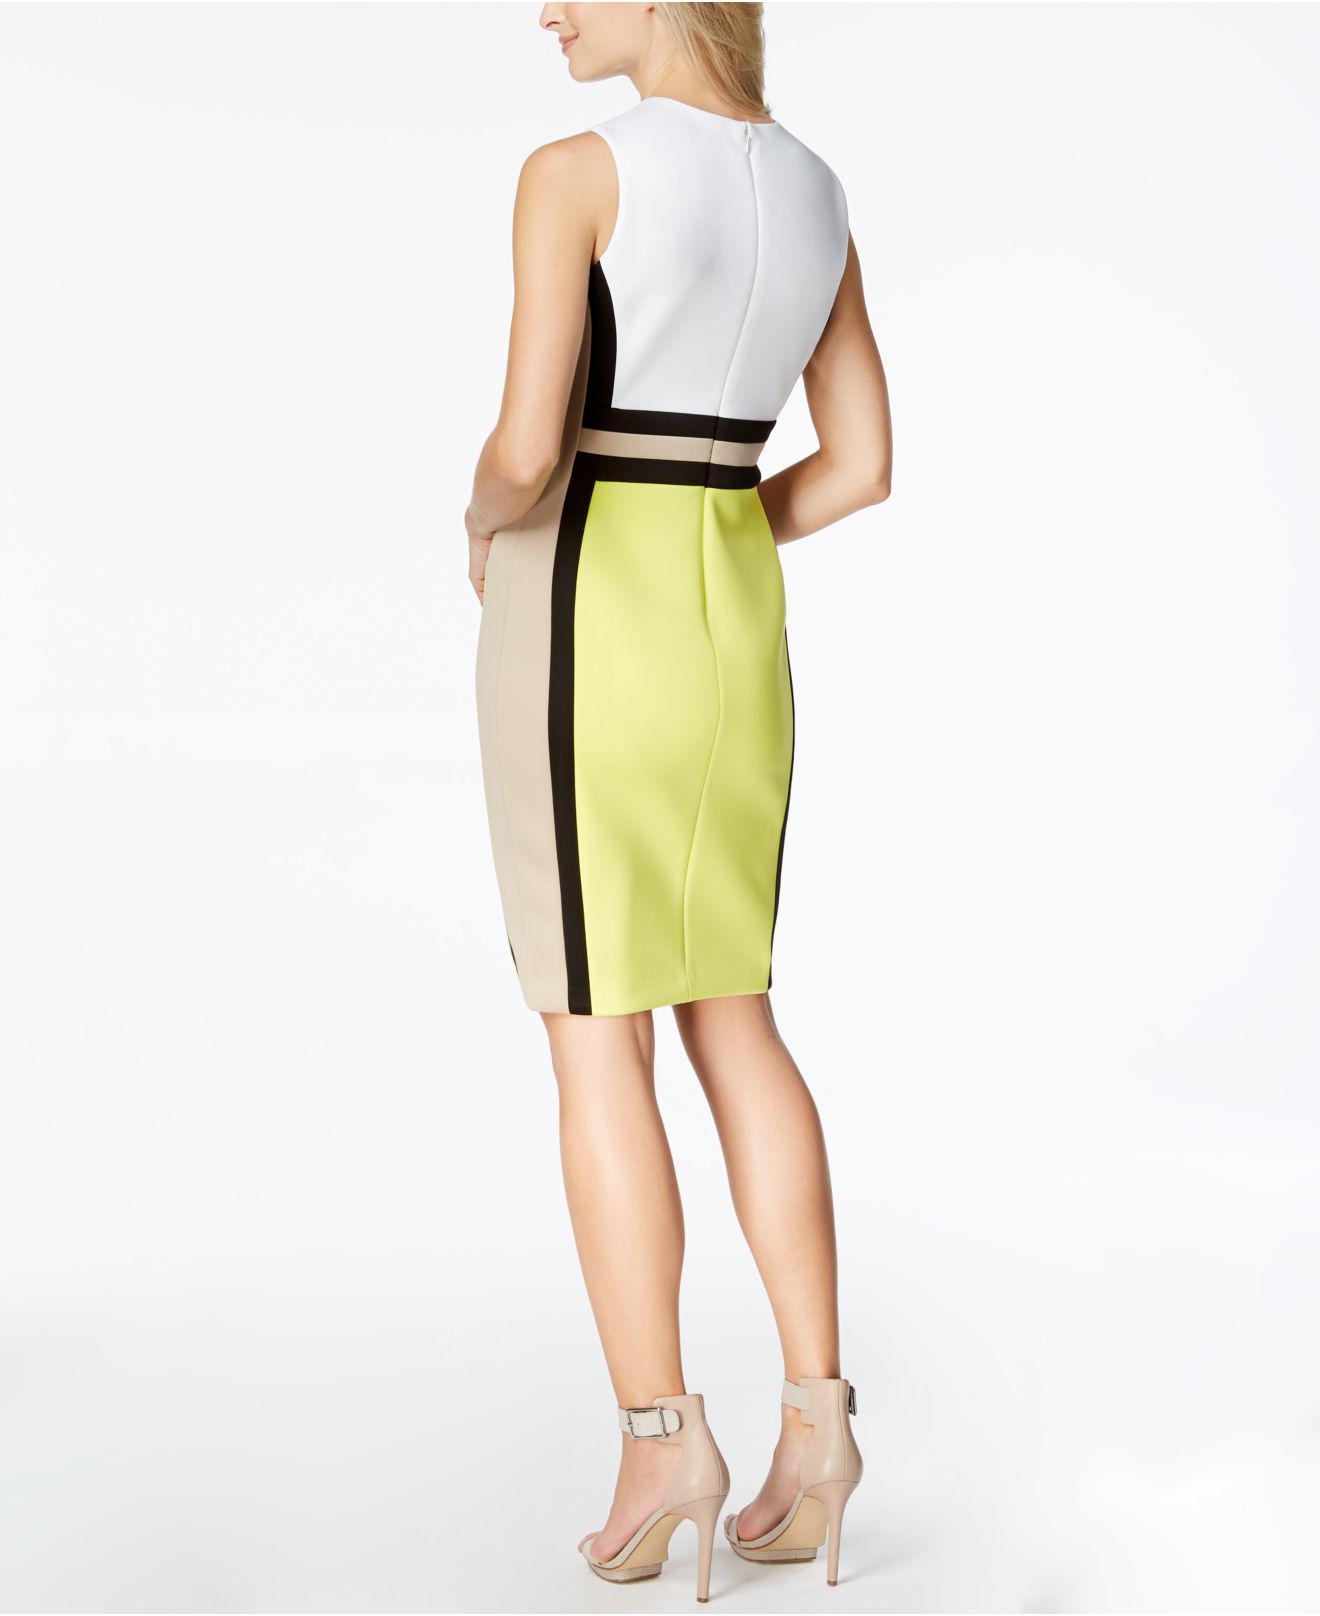 0096f0d3da5 Calvin Klein Petite Colorblocked Sheath Dress - Gomes Weine AG